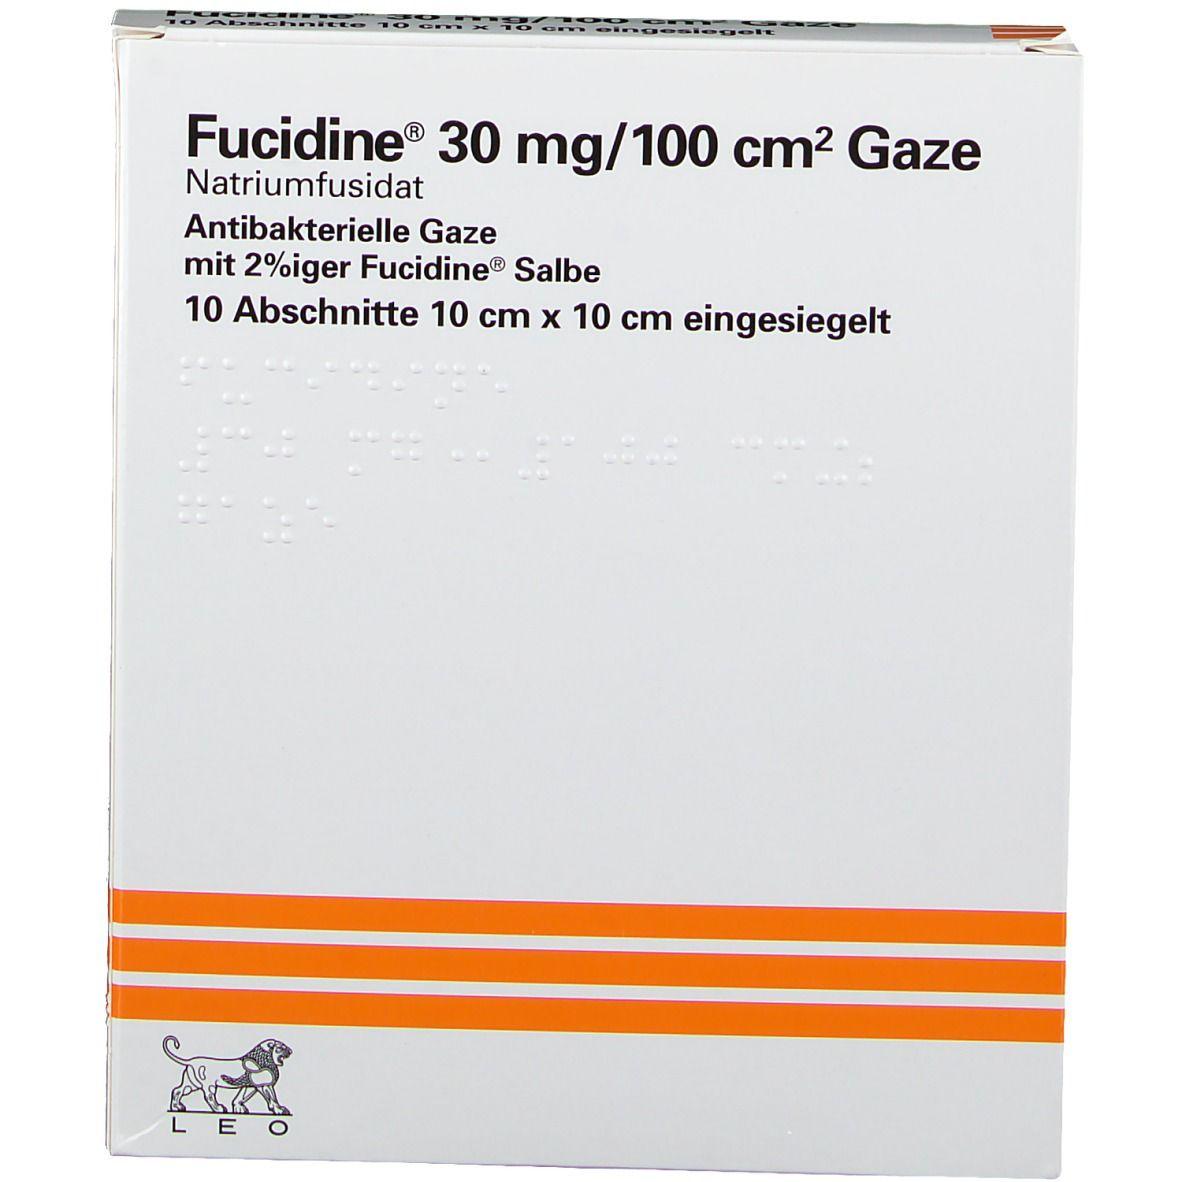 Fucidine Gaze ster.10x10 cm eingesieg.